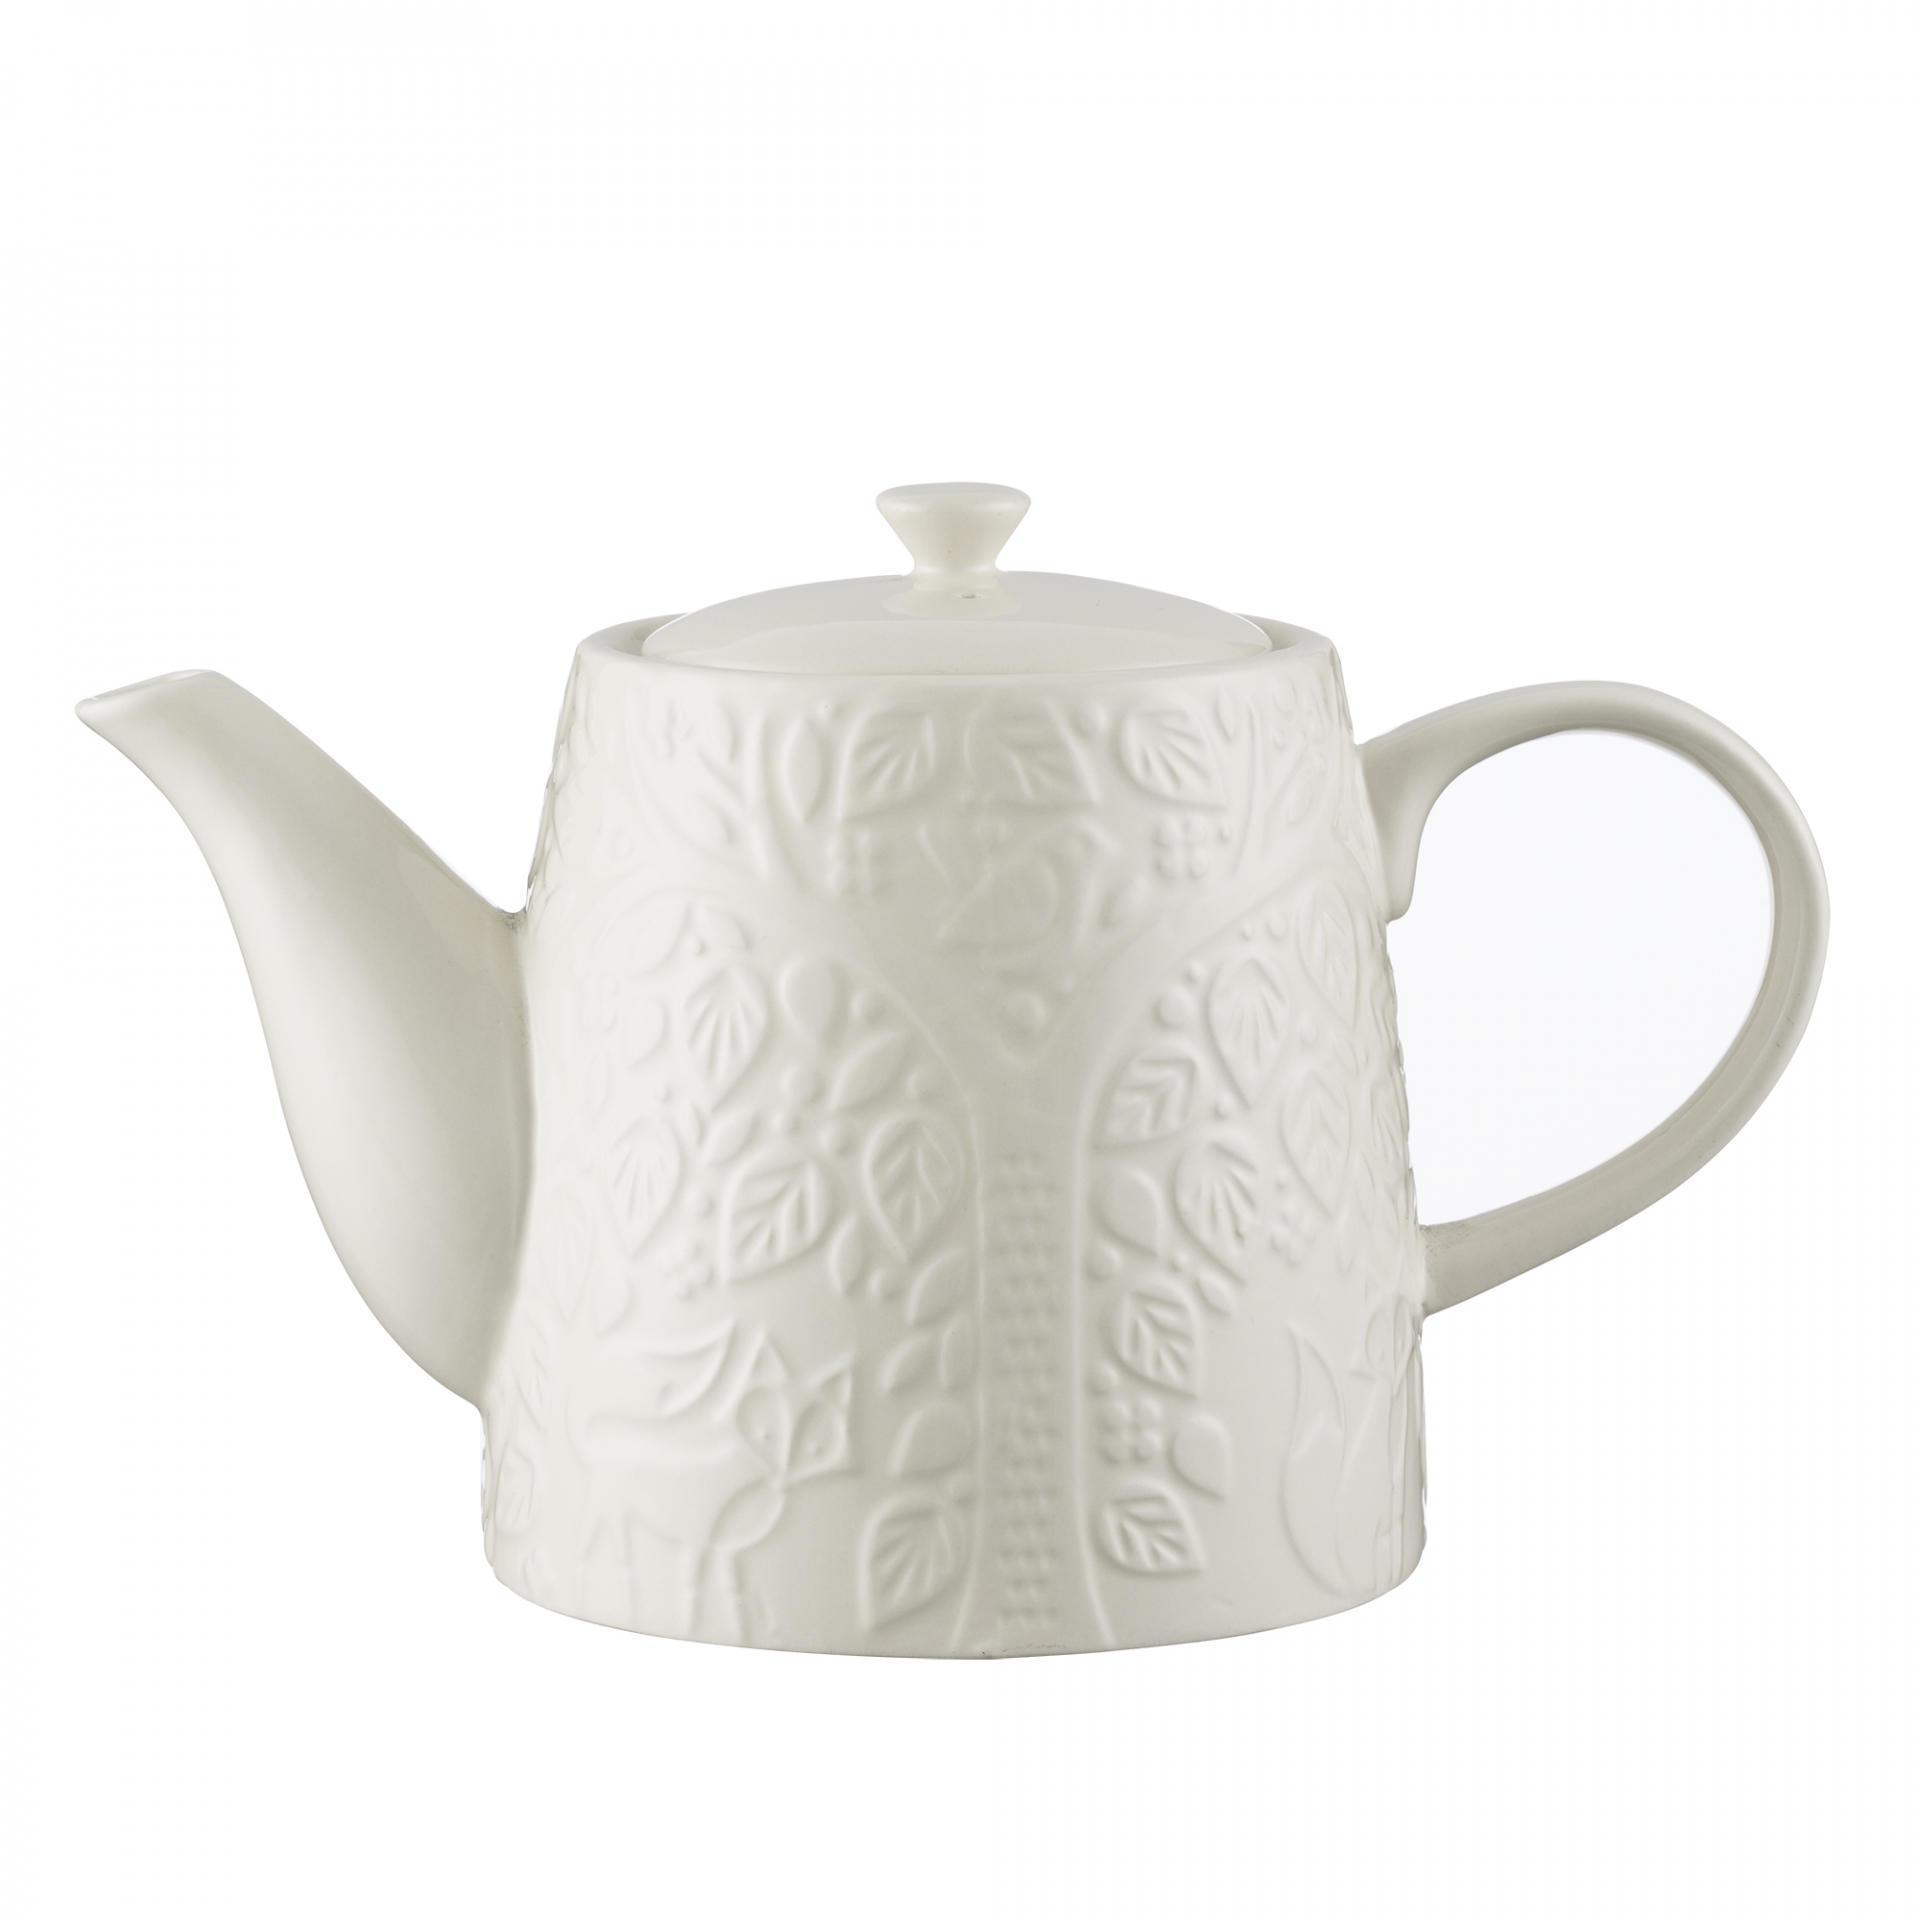 Mason Cash Konvice na čaj In the Forest 1l, krémová barva, keramika